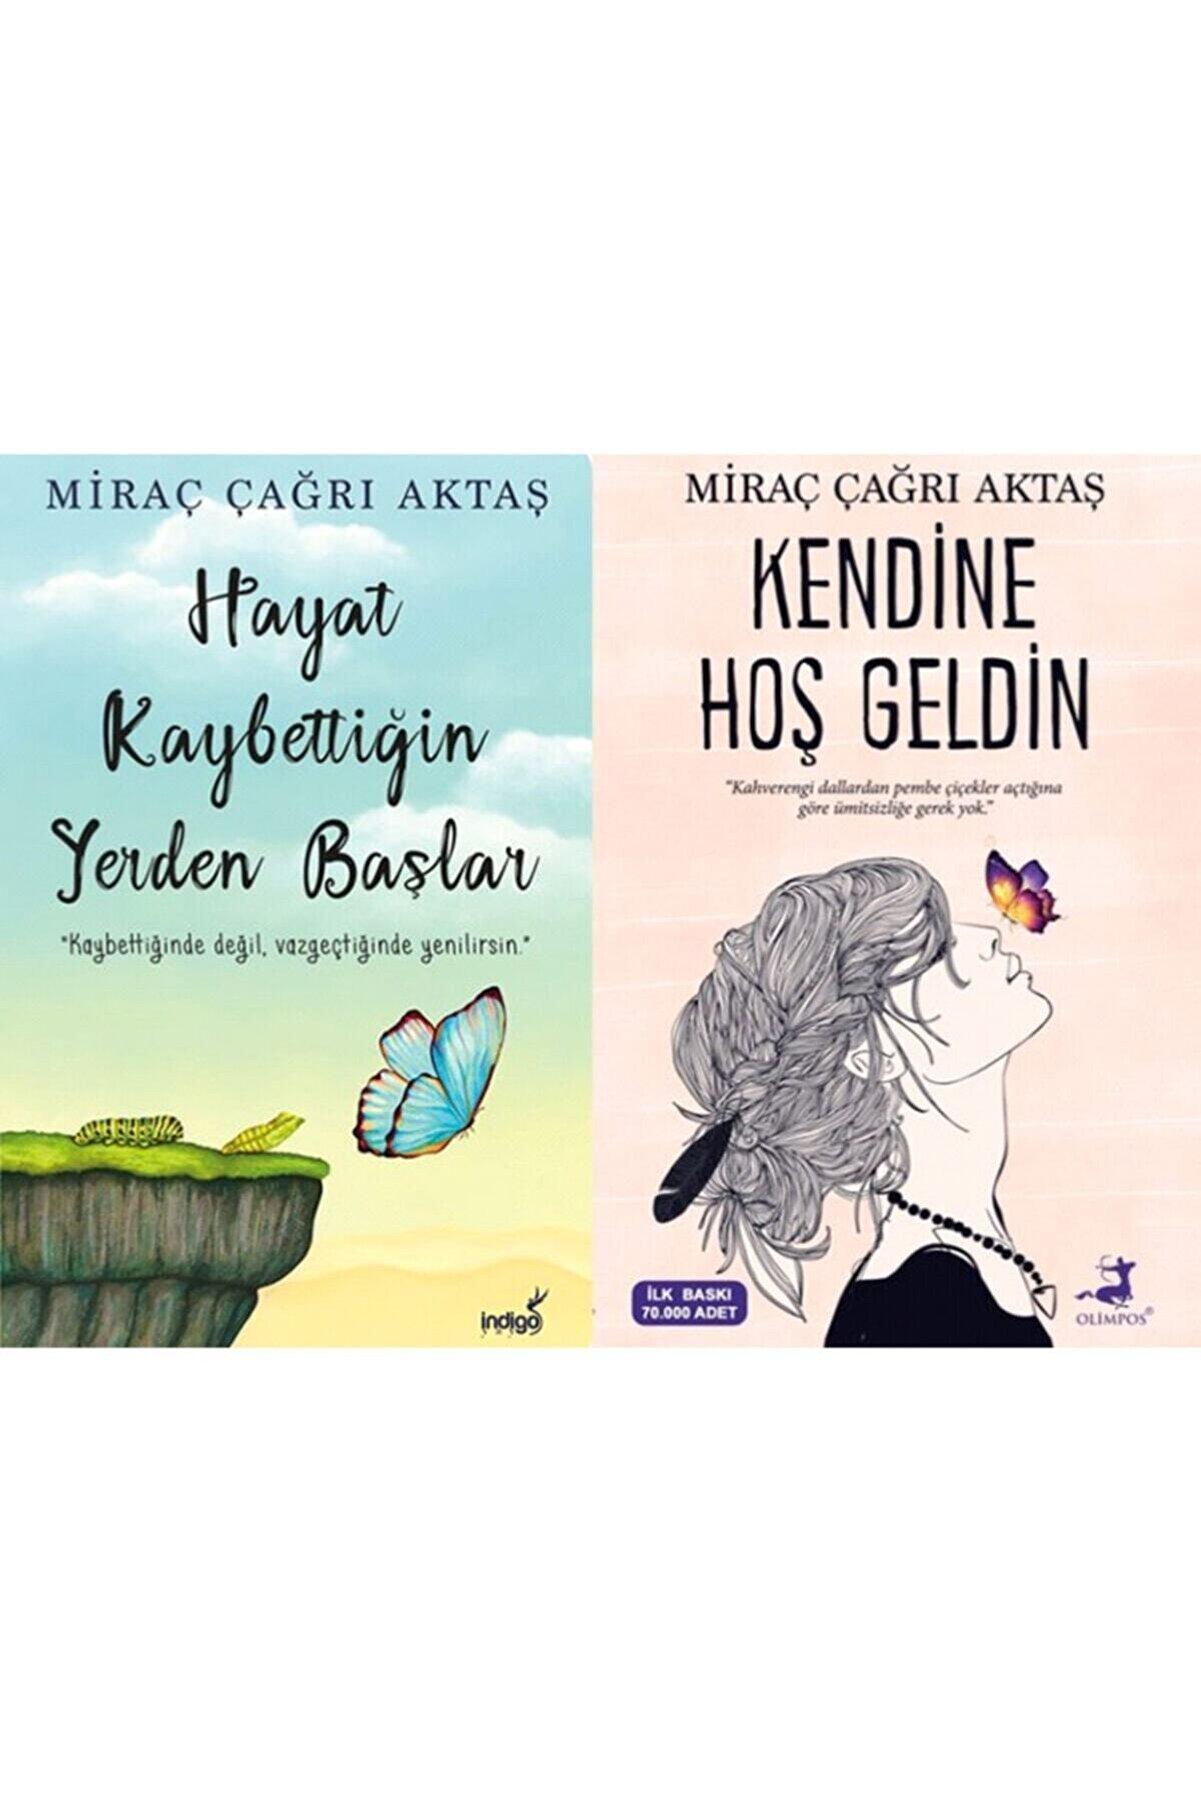 Olimpos Yayınları Miraç Çağrı Aktaş- 2 Kitap Set